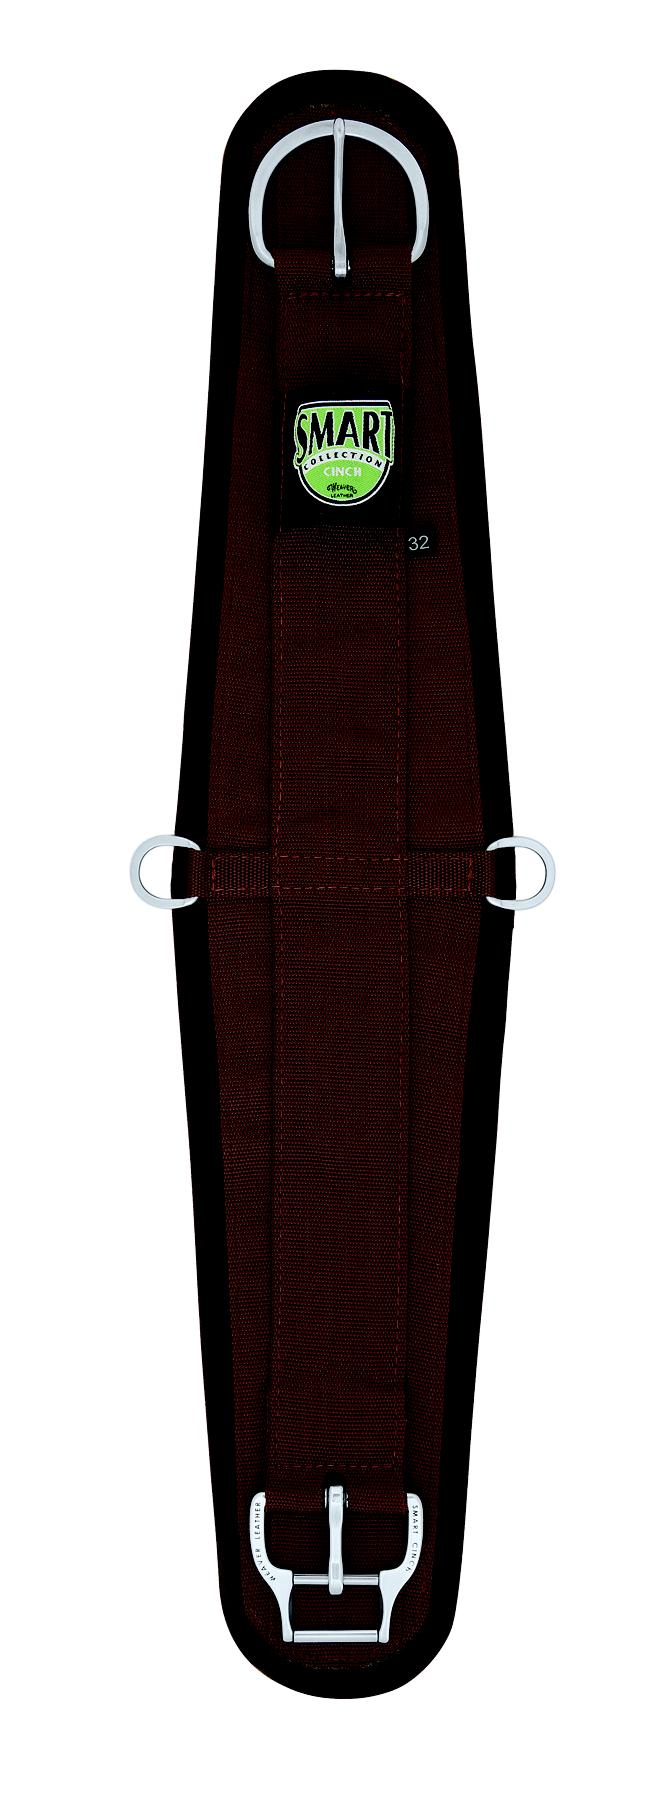 Weaver Leather Neoprene Roper Smart Cinch